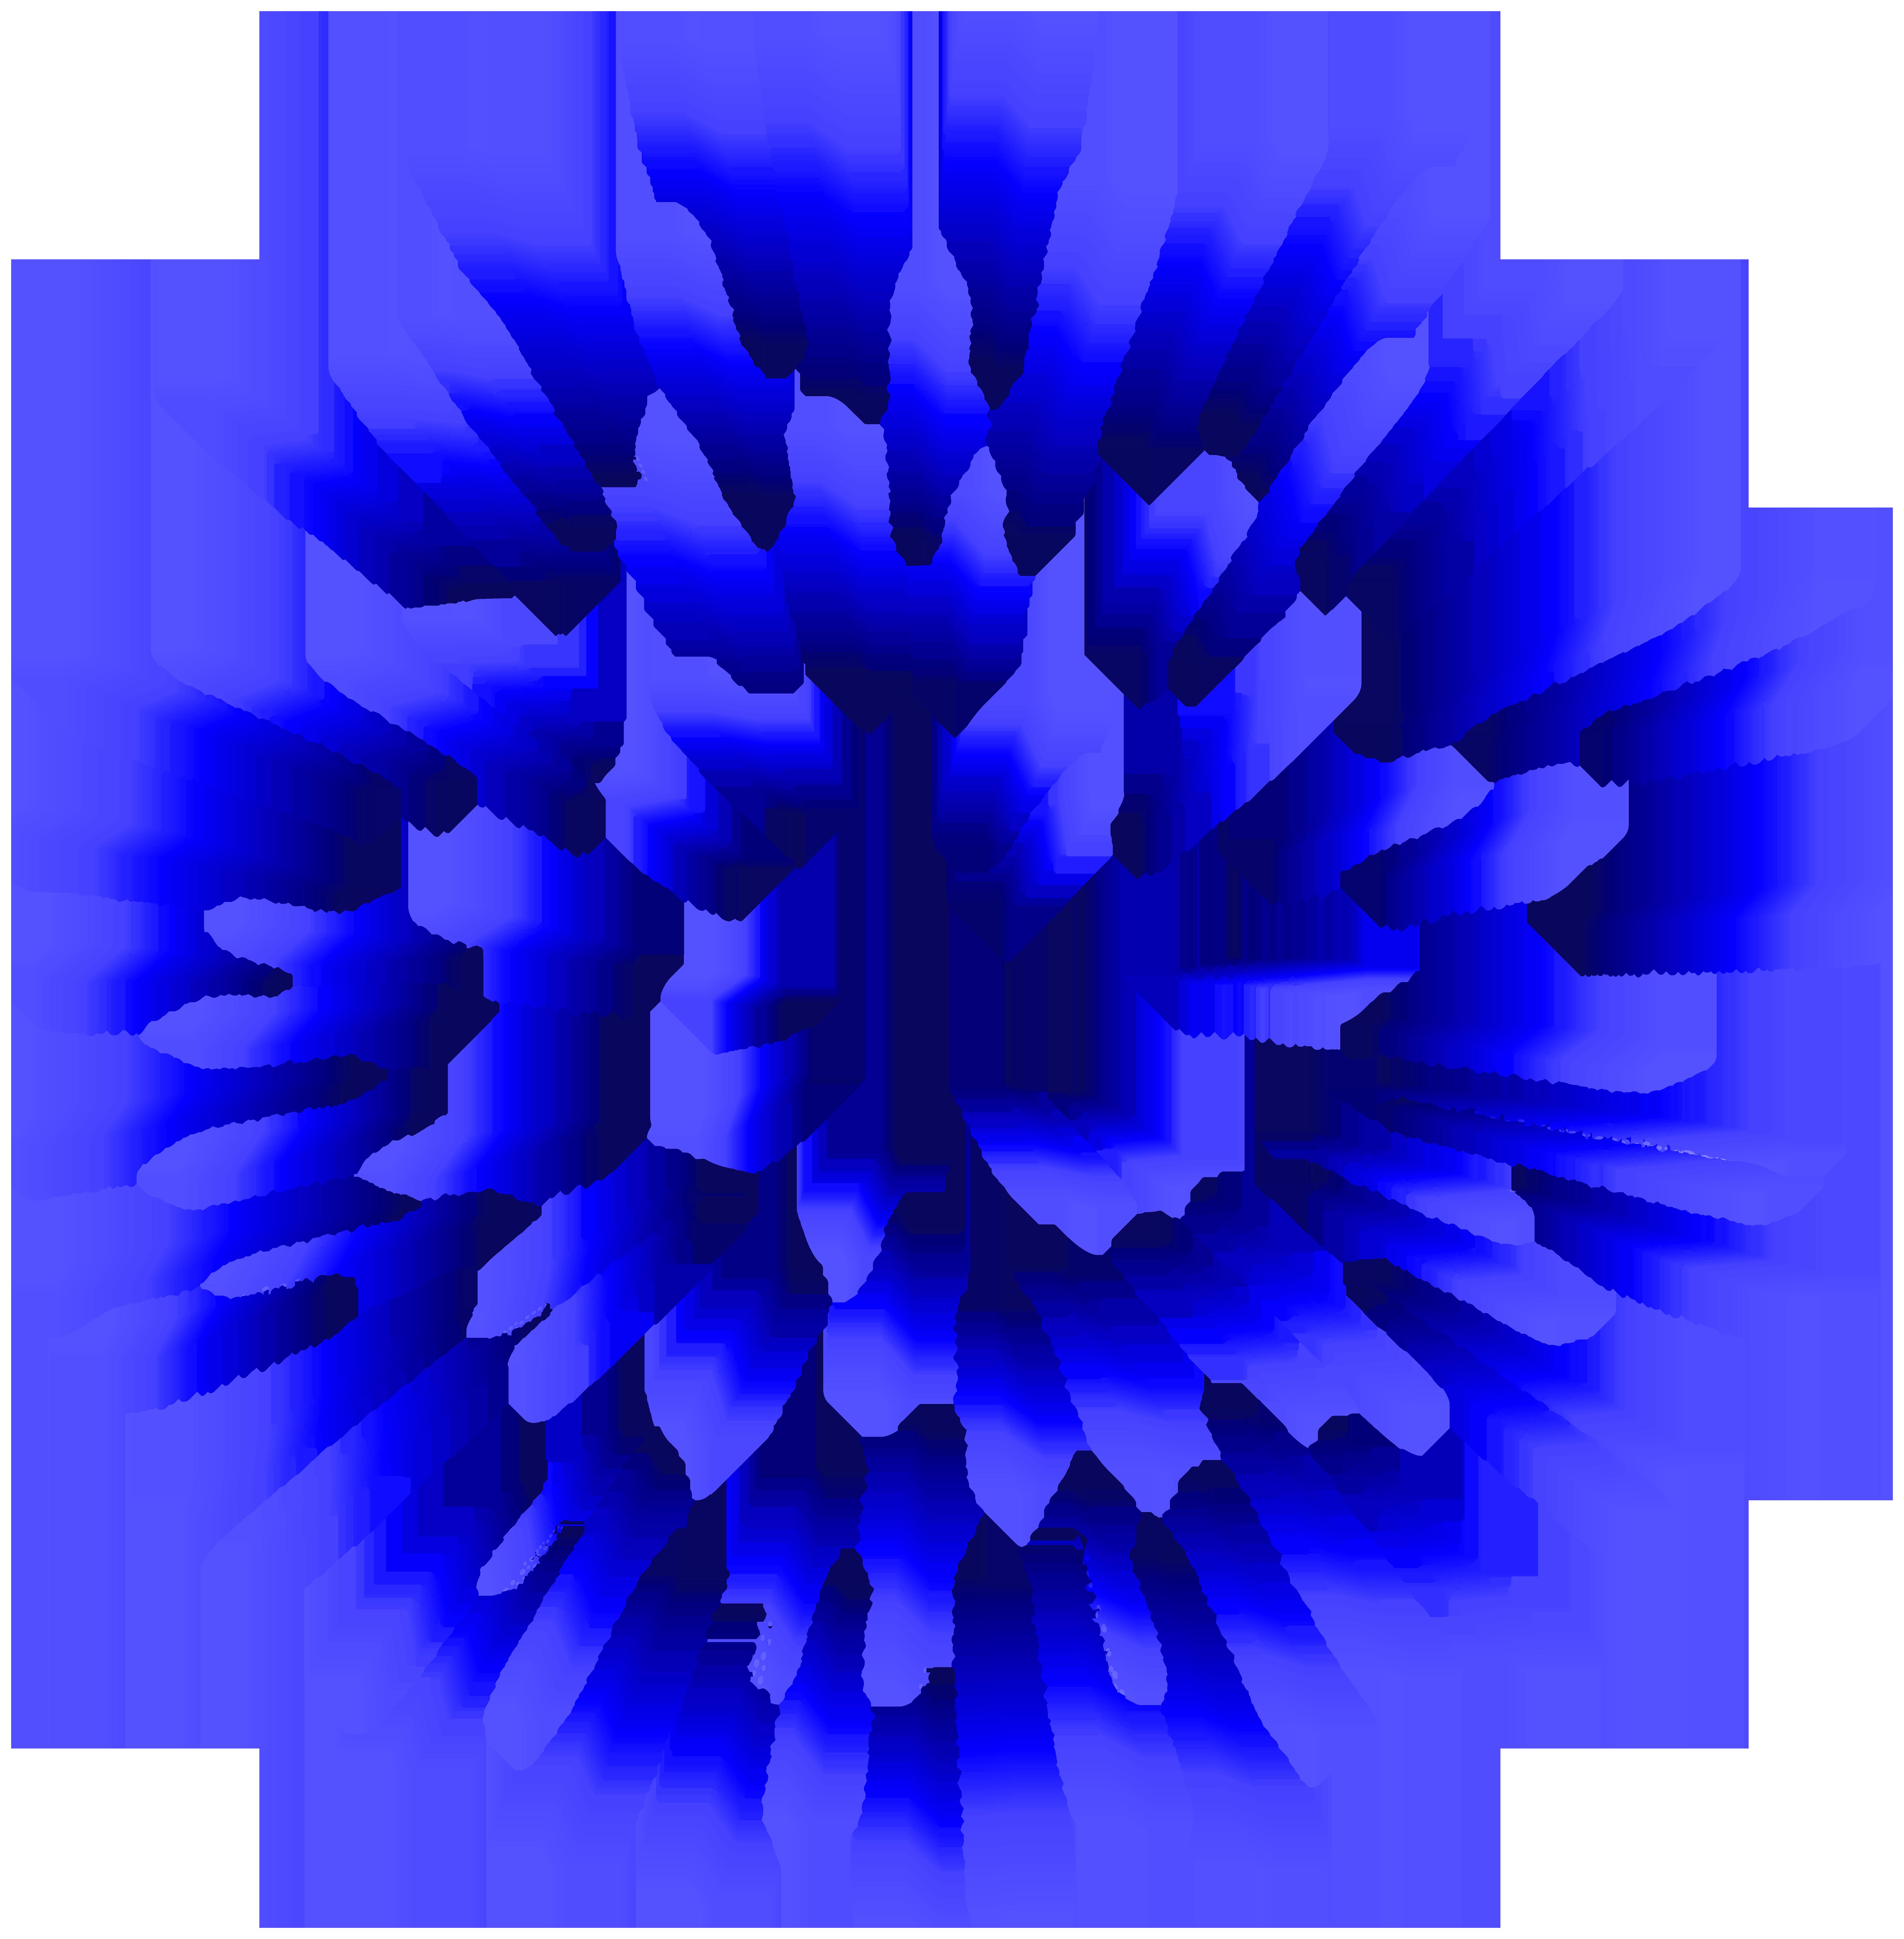 Firework blue png image. Clipart fireworks clip art